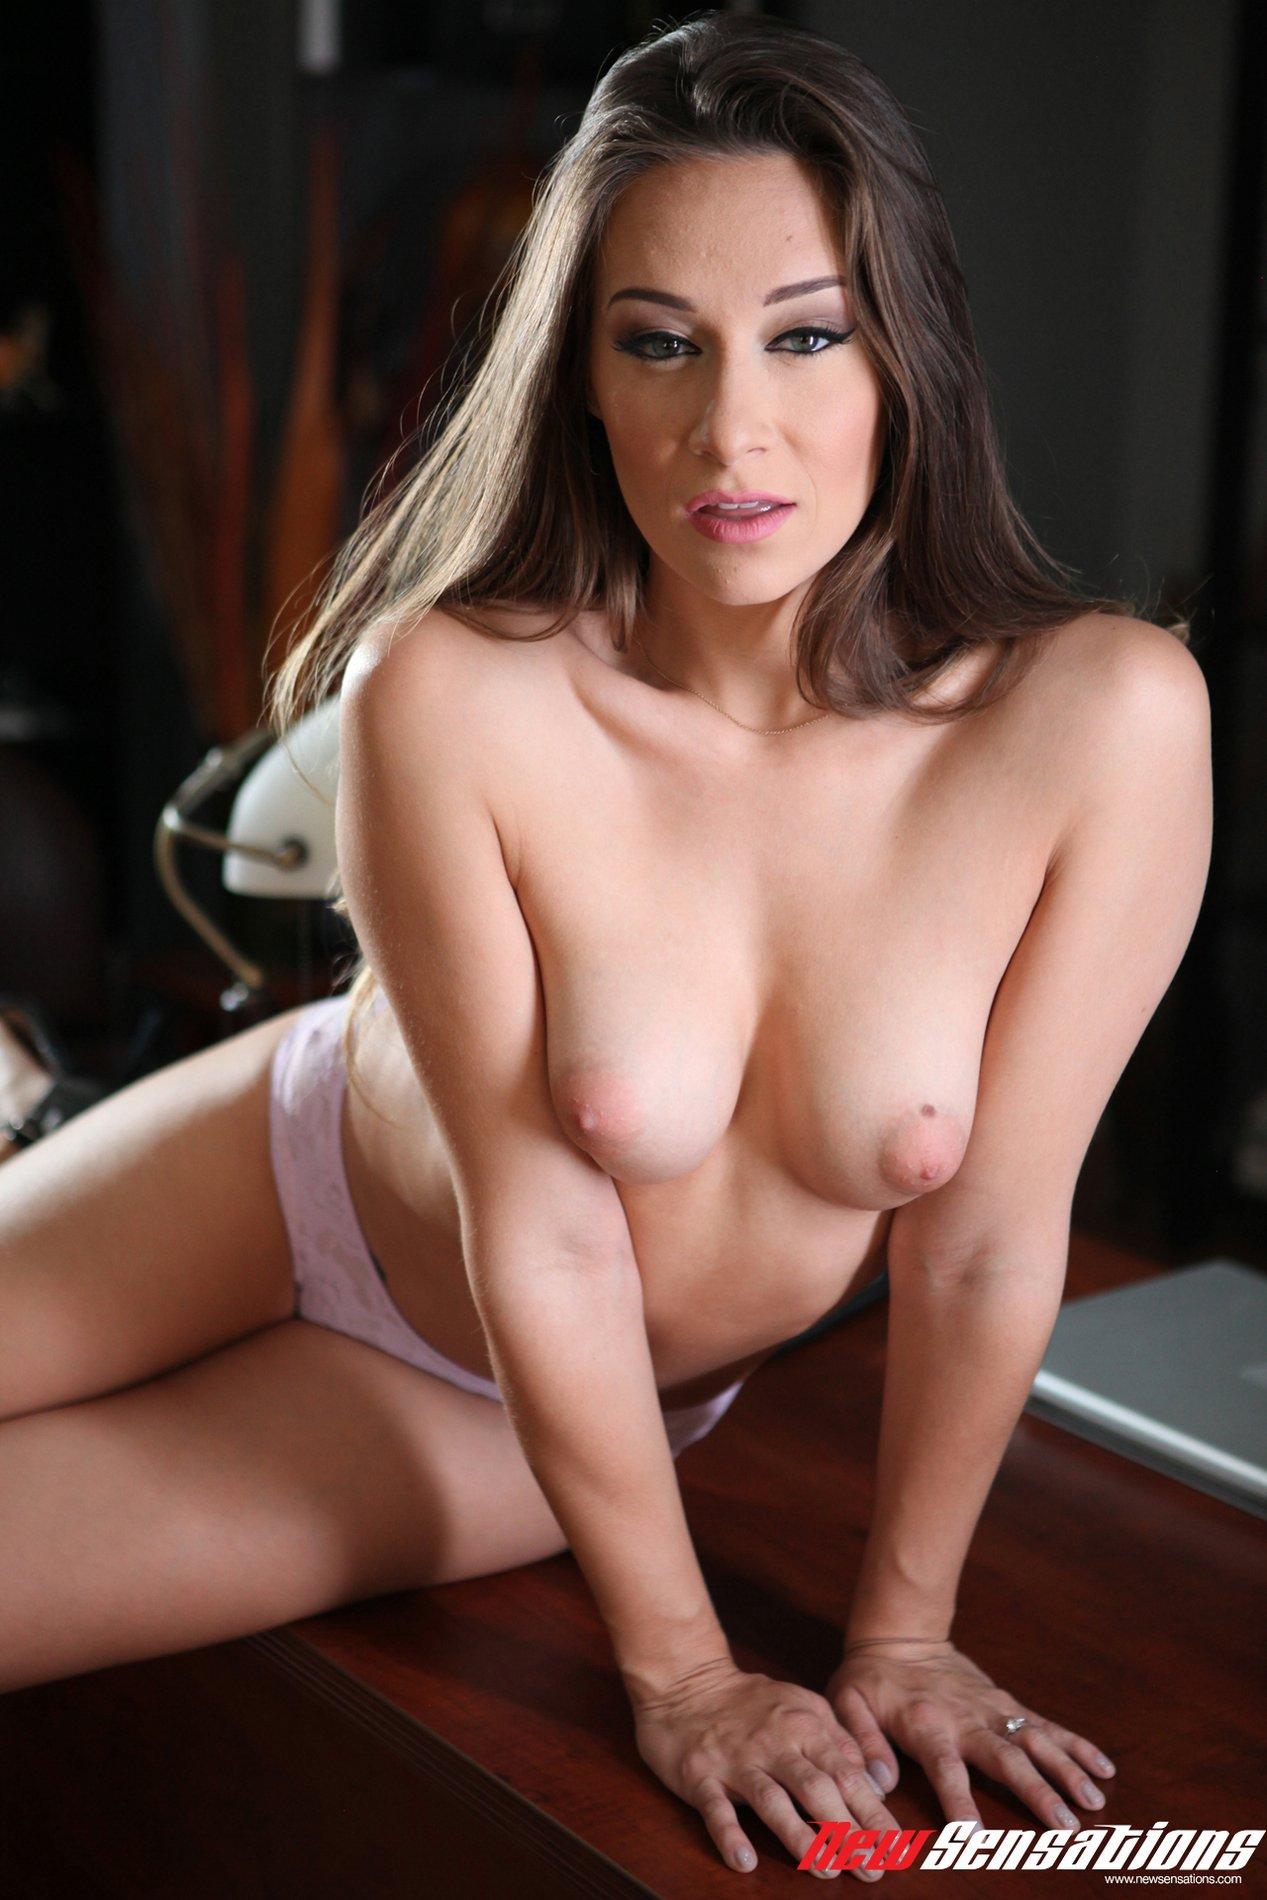 Bridget bond porn